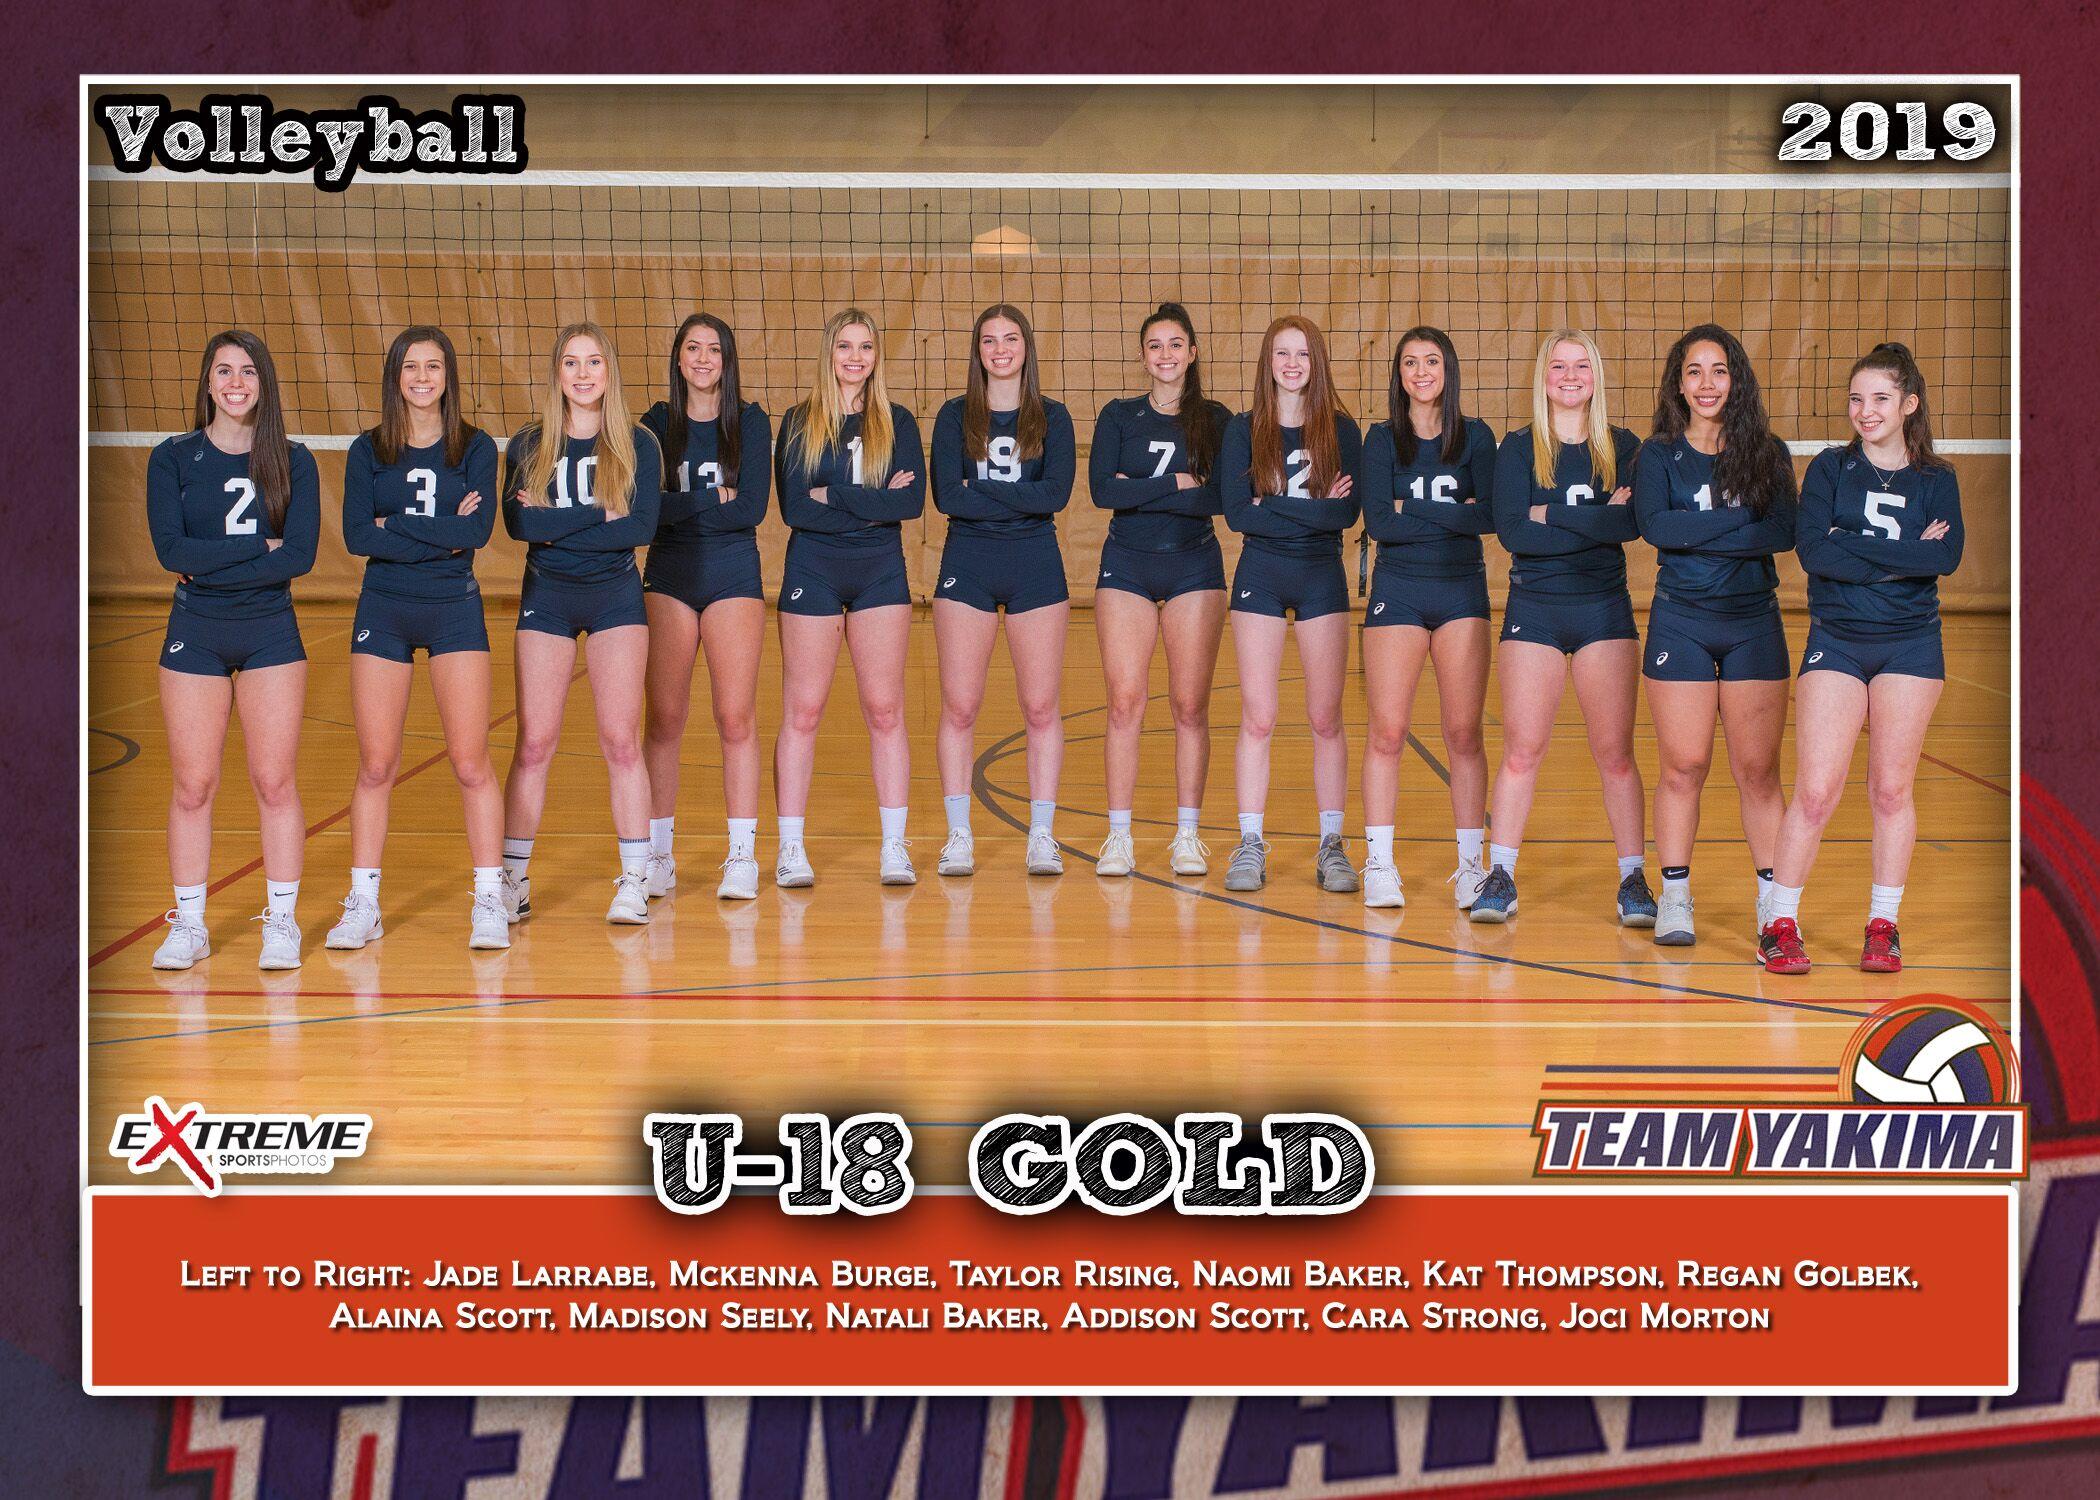 Team Yakima 18 Gold